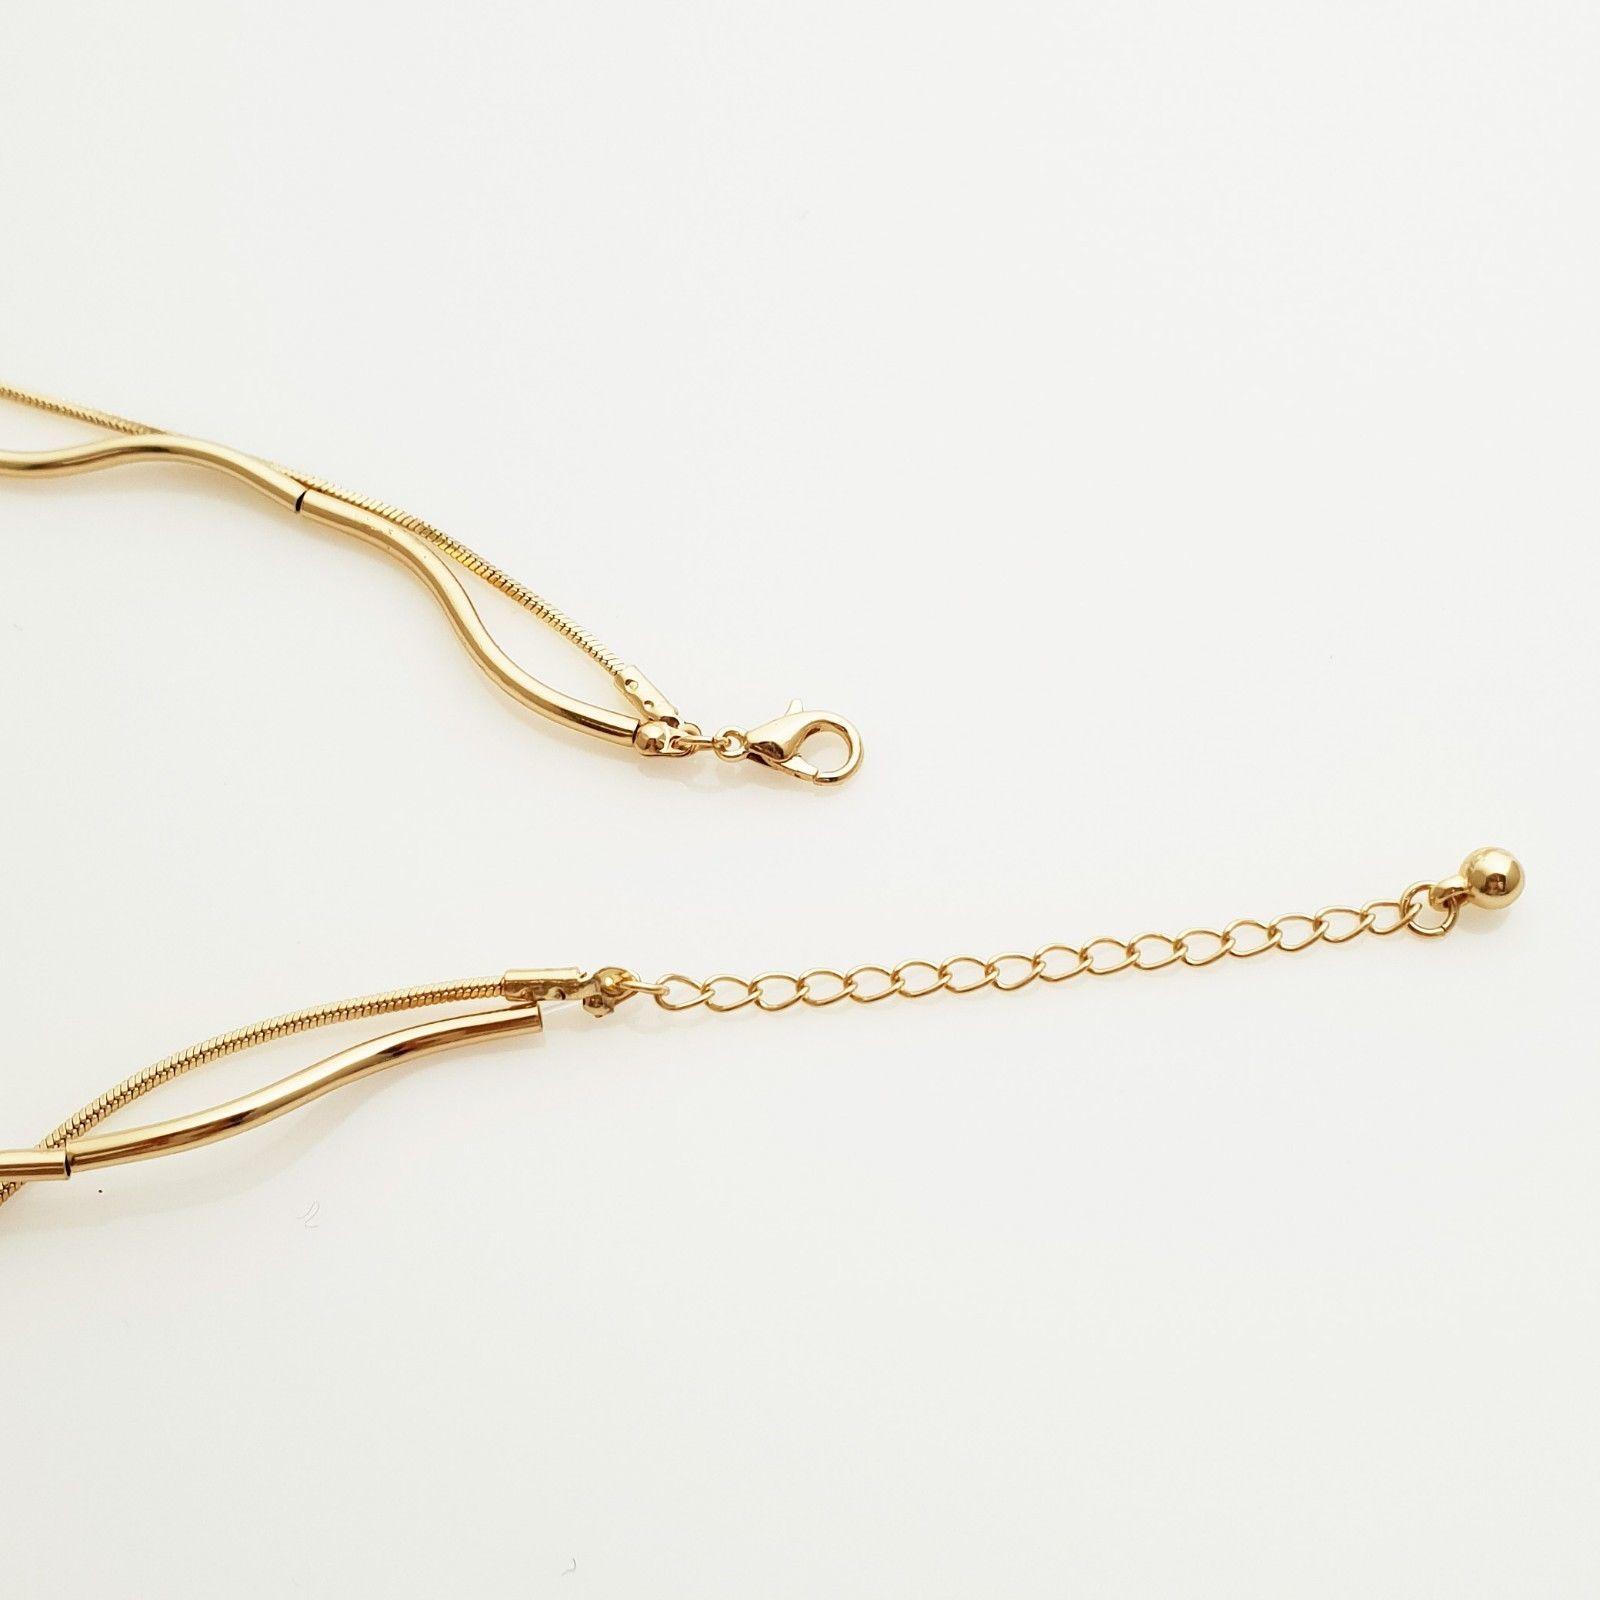 Multi-Strand Curved Bar Choker Necklace Brass Gold Tone Fashion Item N20